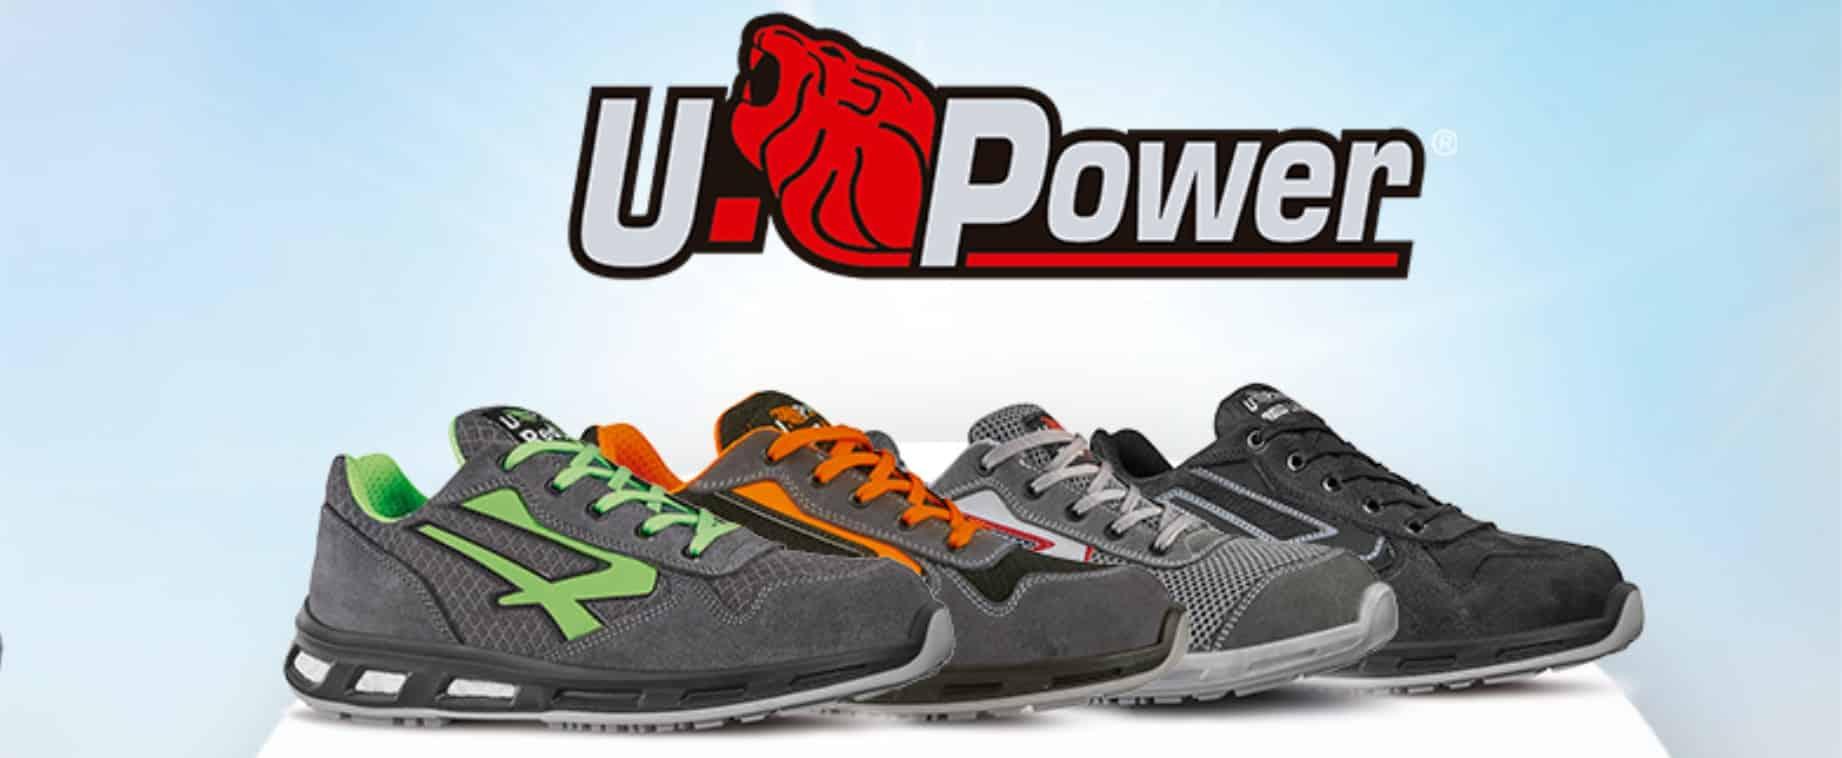 Scarpe antinfortunistiche U-Power